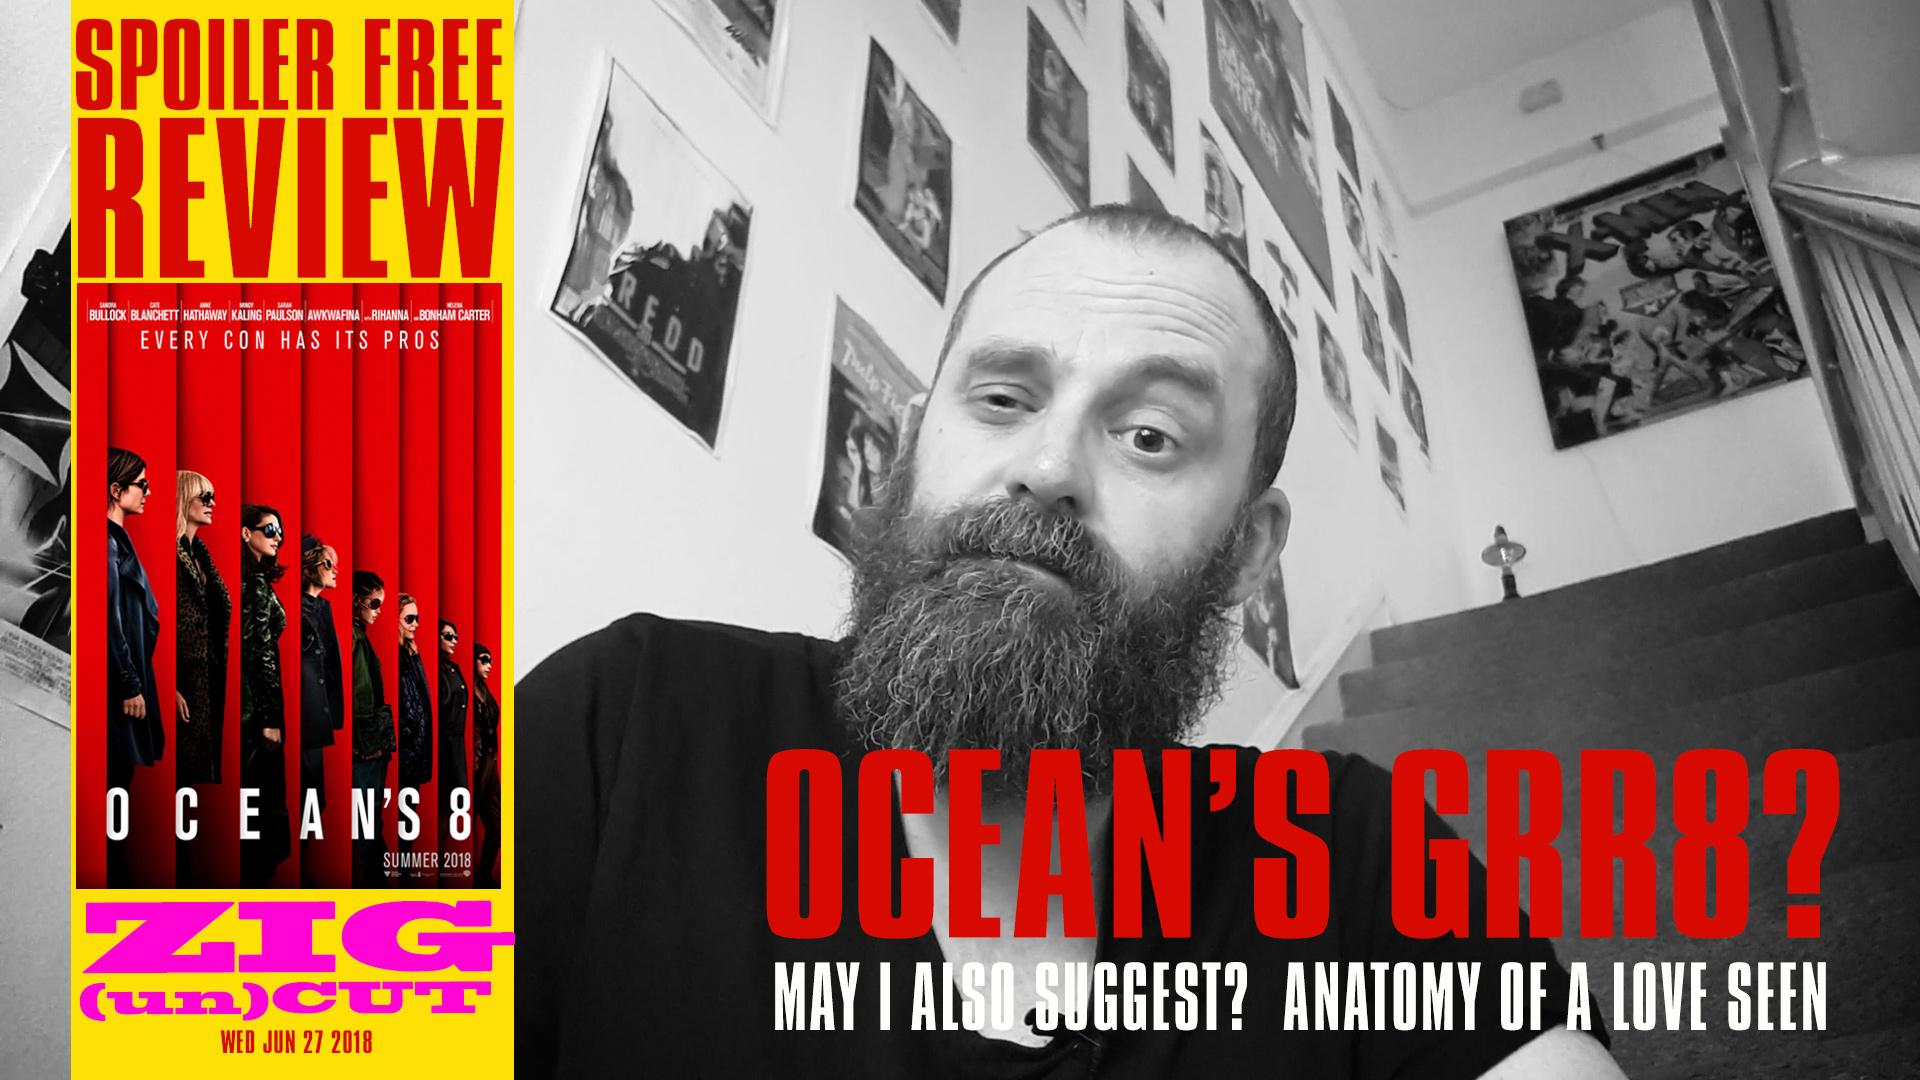 Anatomy Of A Love Seen En Español zig (un)cut – ocean's 8 spoiler free review – diary of short